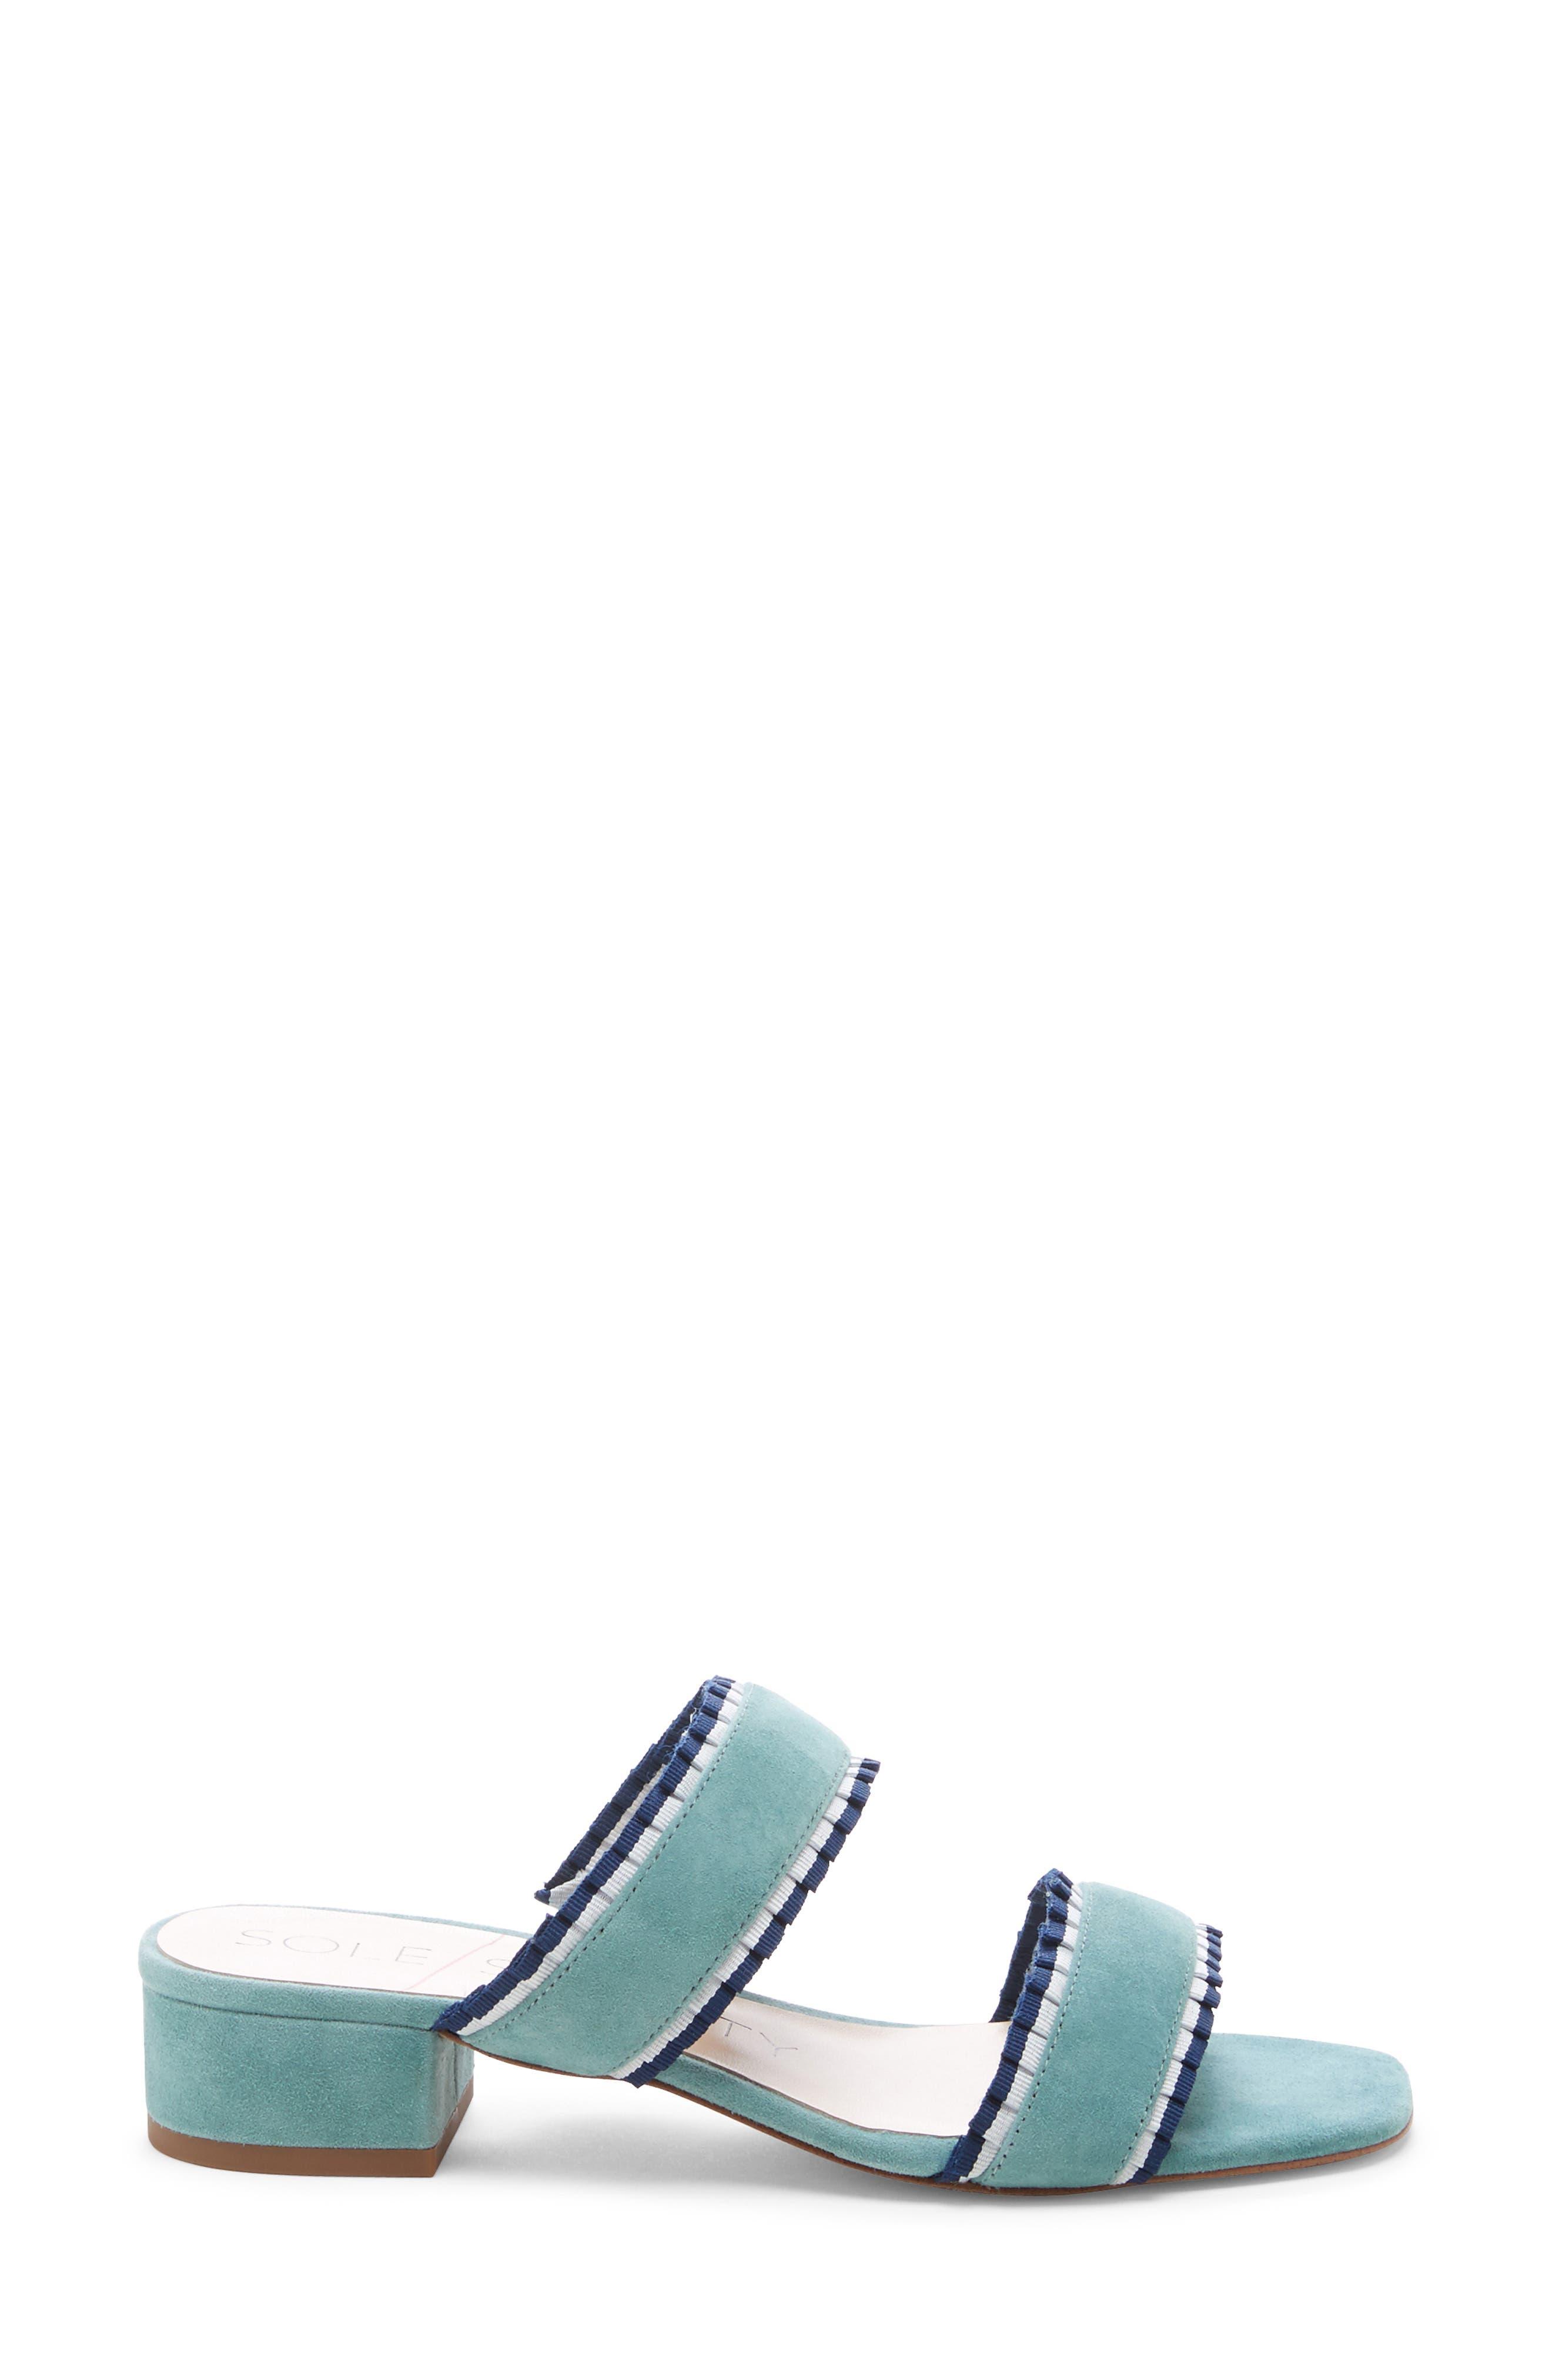 SOLE SOCIETY,                             Elura Slide Sandal,                             Alternate thumbnail 3, color,                             LIGHT SEA GREEN SUEDE